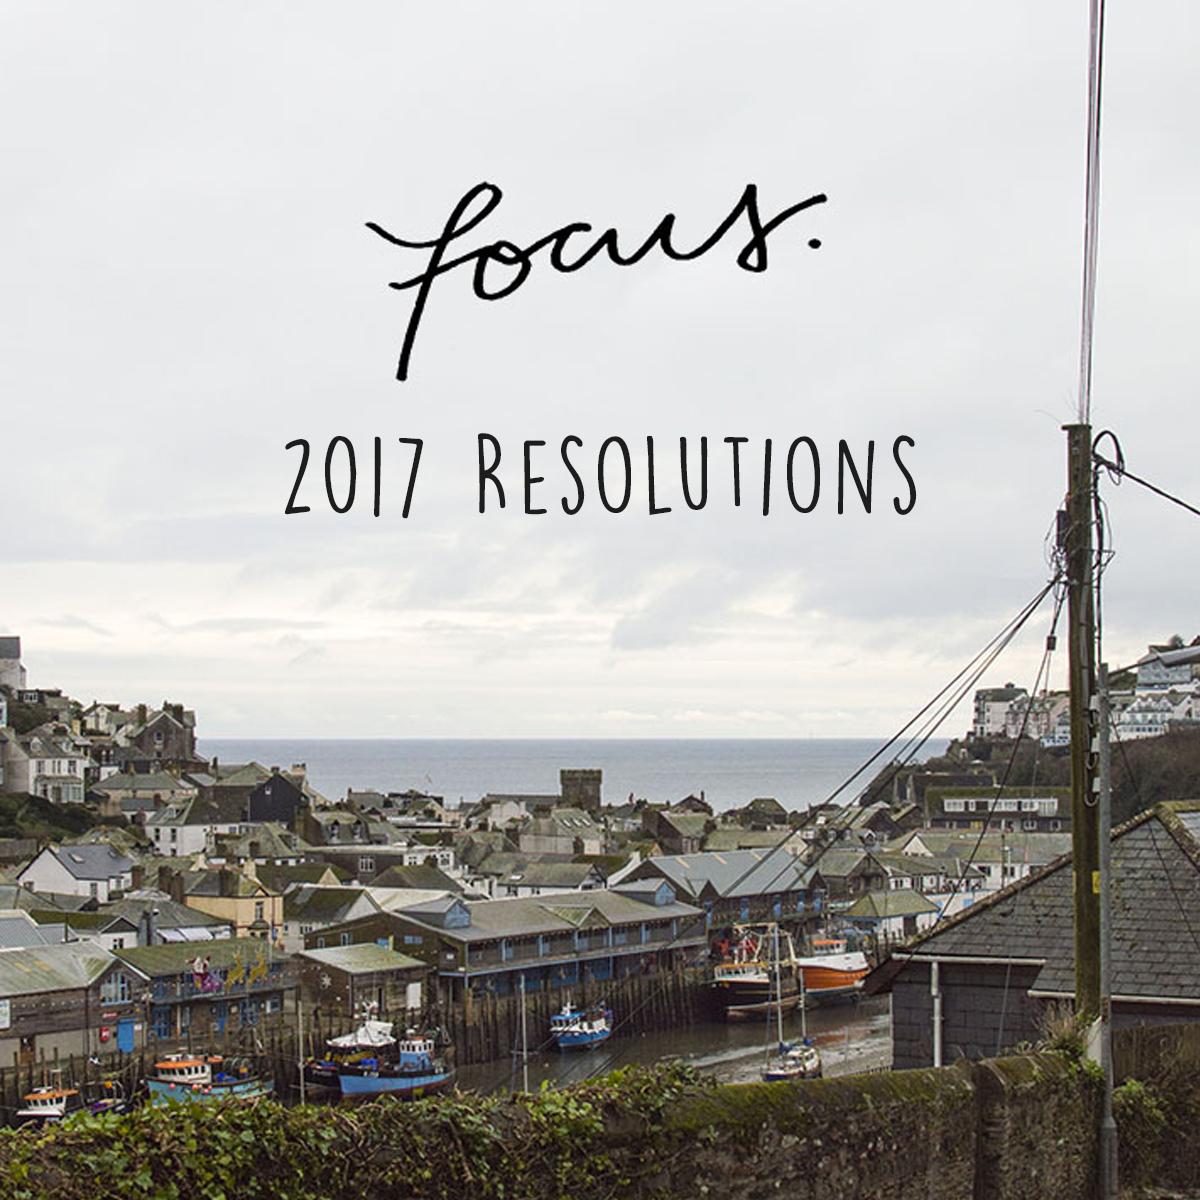 2017 resolutions.jpg